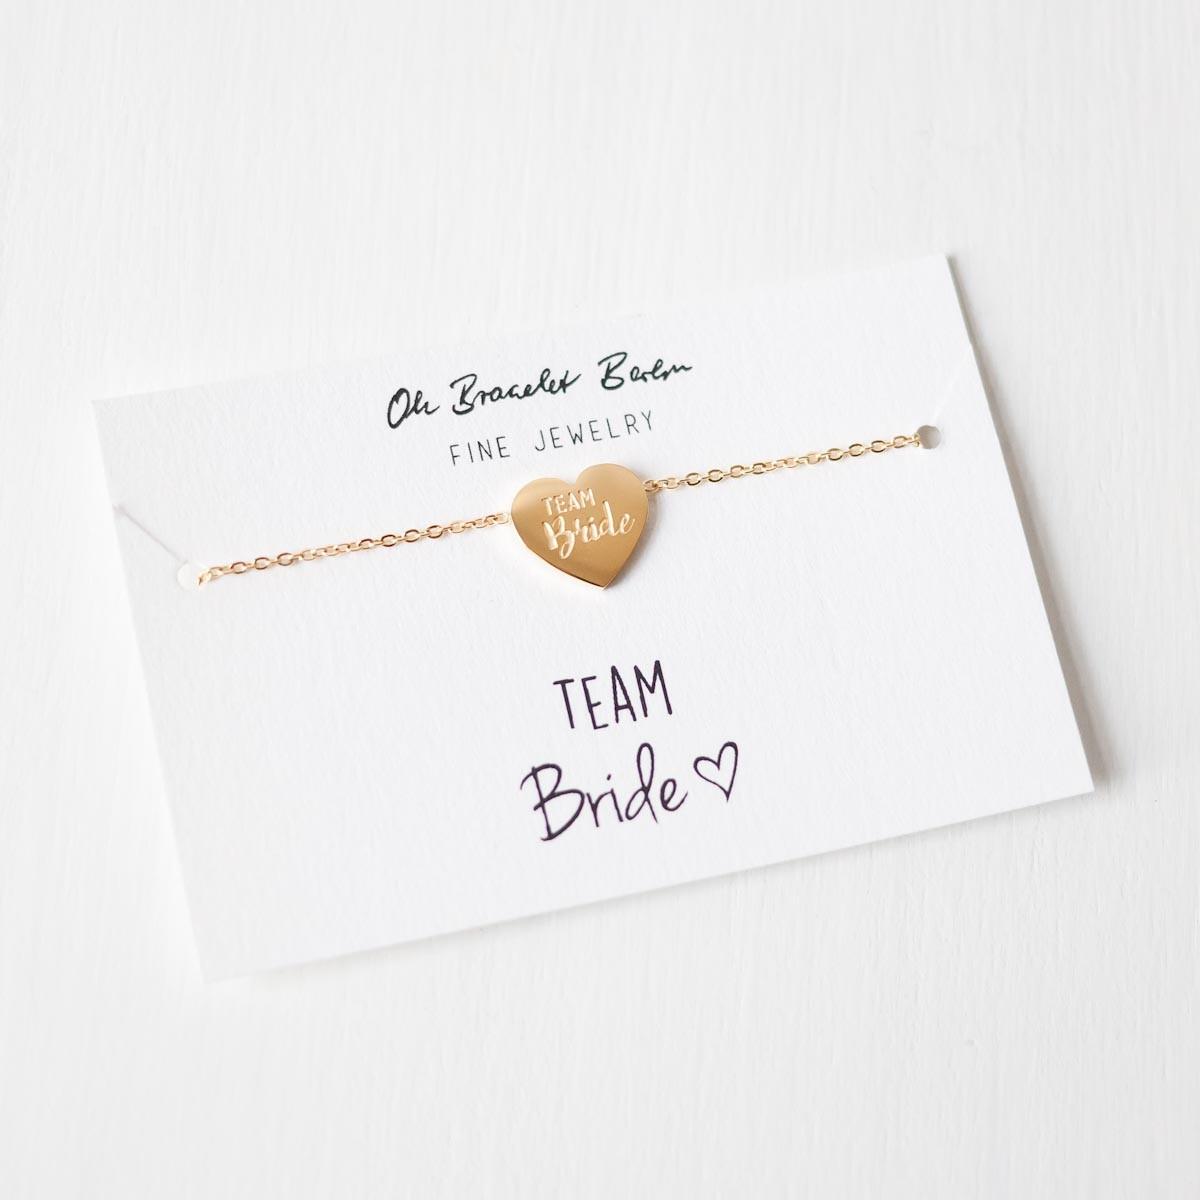 Oh Bracelet Berlin – Team Bride Armband II aus Edelstahl, vergoldet